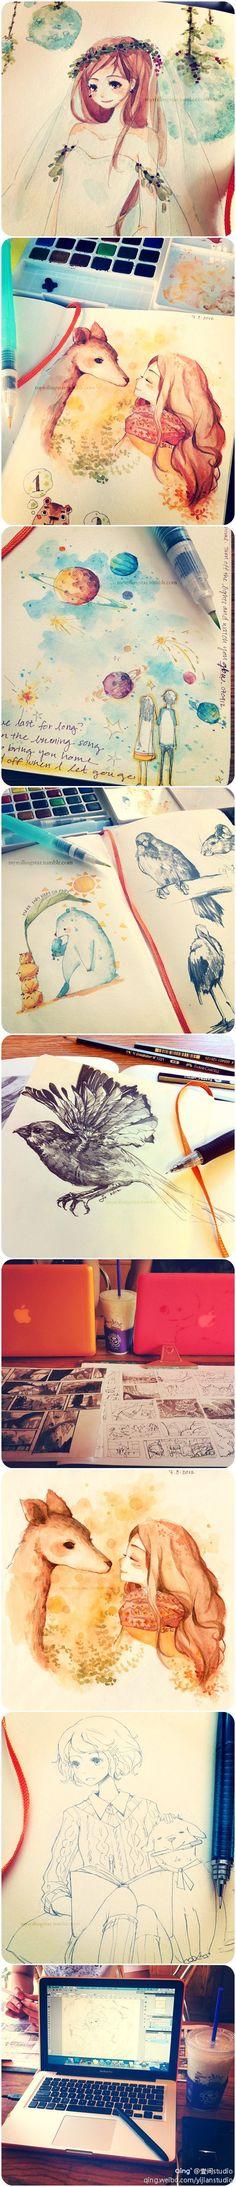 Watercolour art. The artist did a great job.